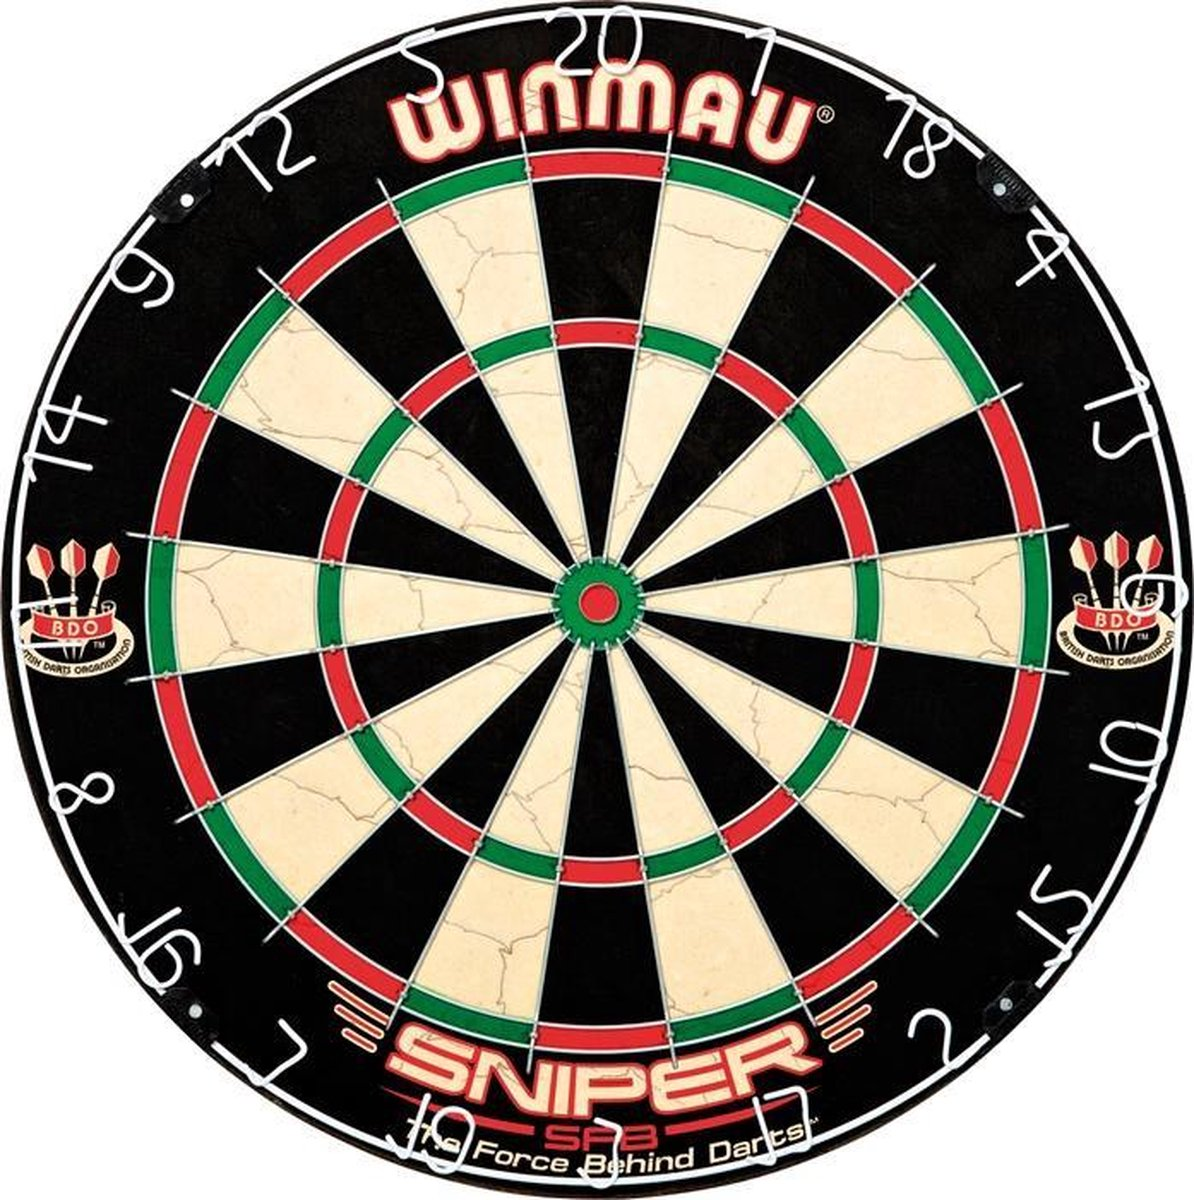 Dartbord Winmau Sniper set incl. dartpijlen